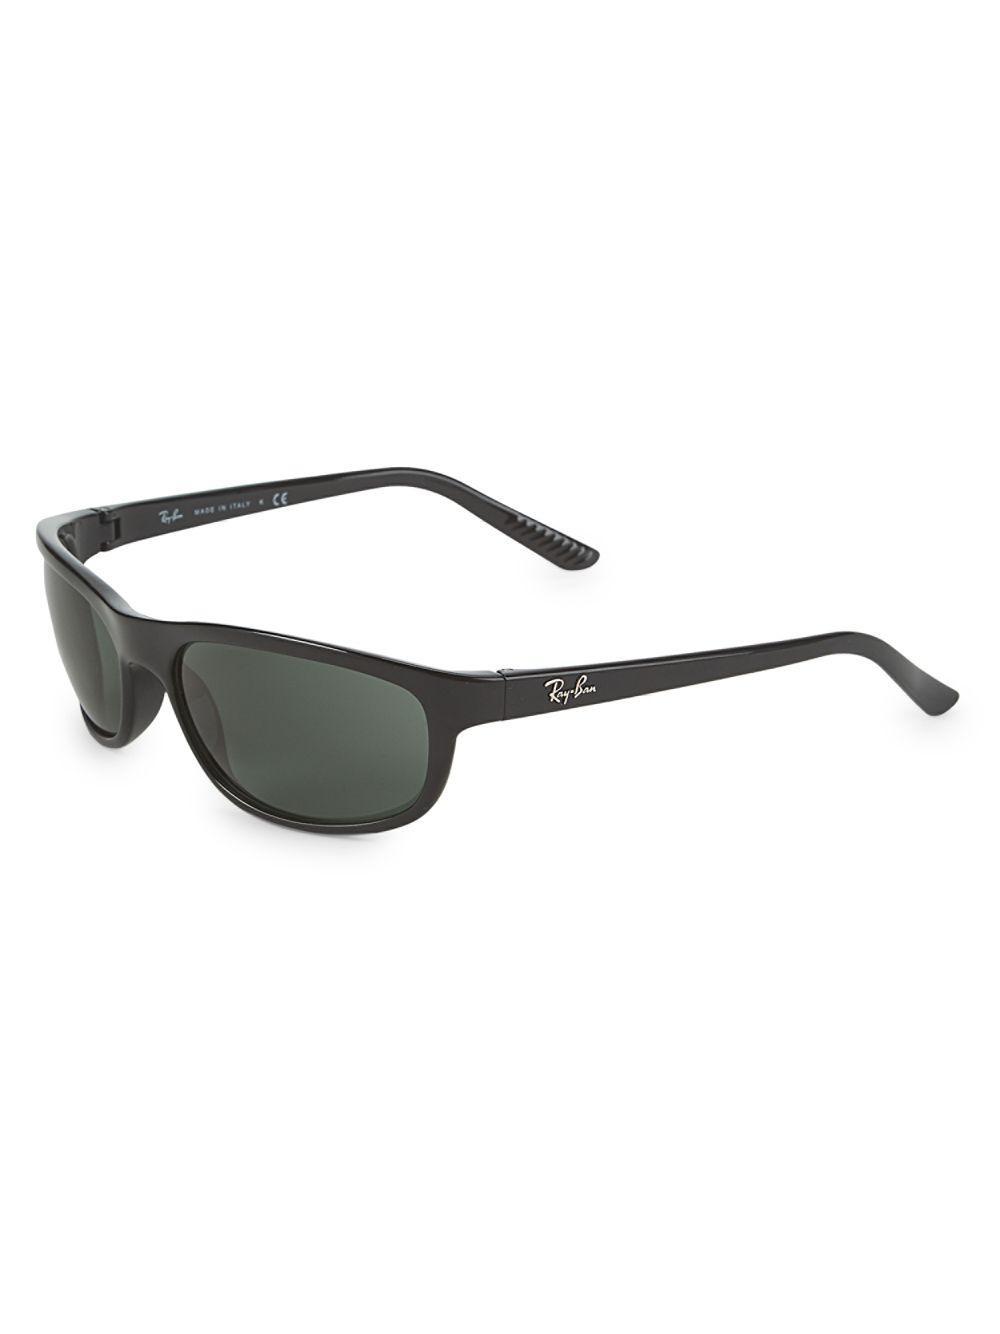 eda6d2aaa65 Ray-Ban - Black 62mm Shield Sunglasses - Lyst. View fullscreen